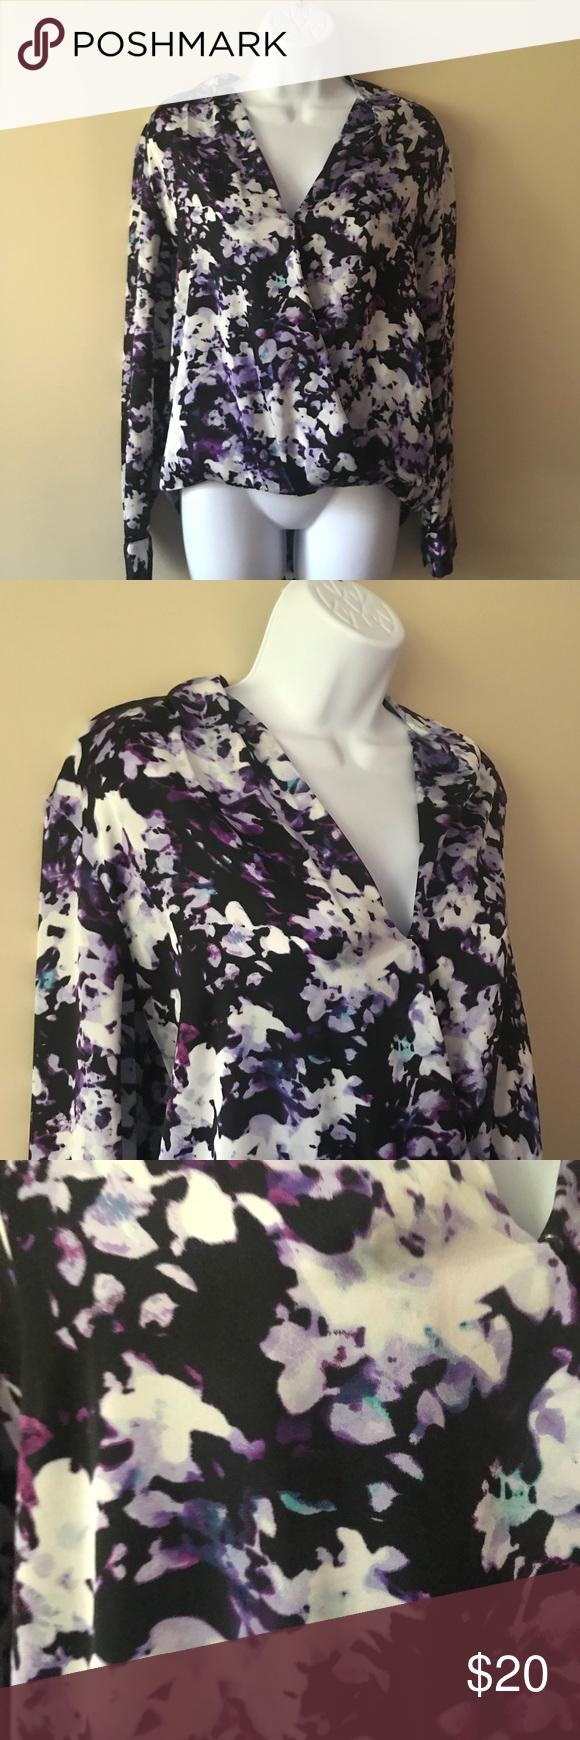 Apartment 9 Floral Blouse Shirt Top Purple Black In 2018 My Posh